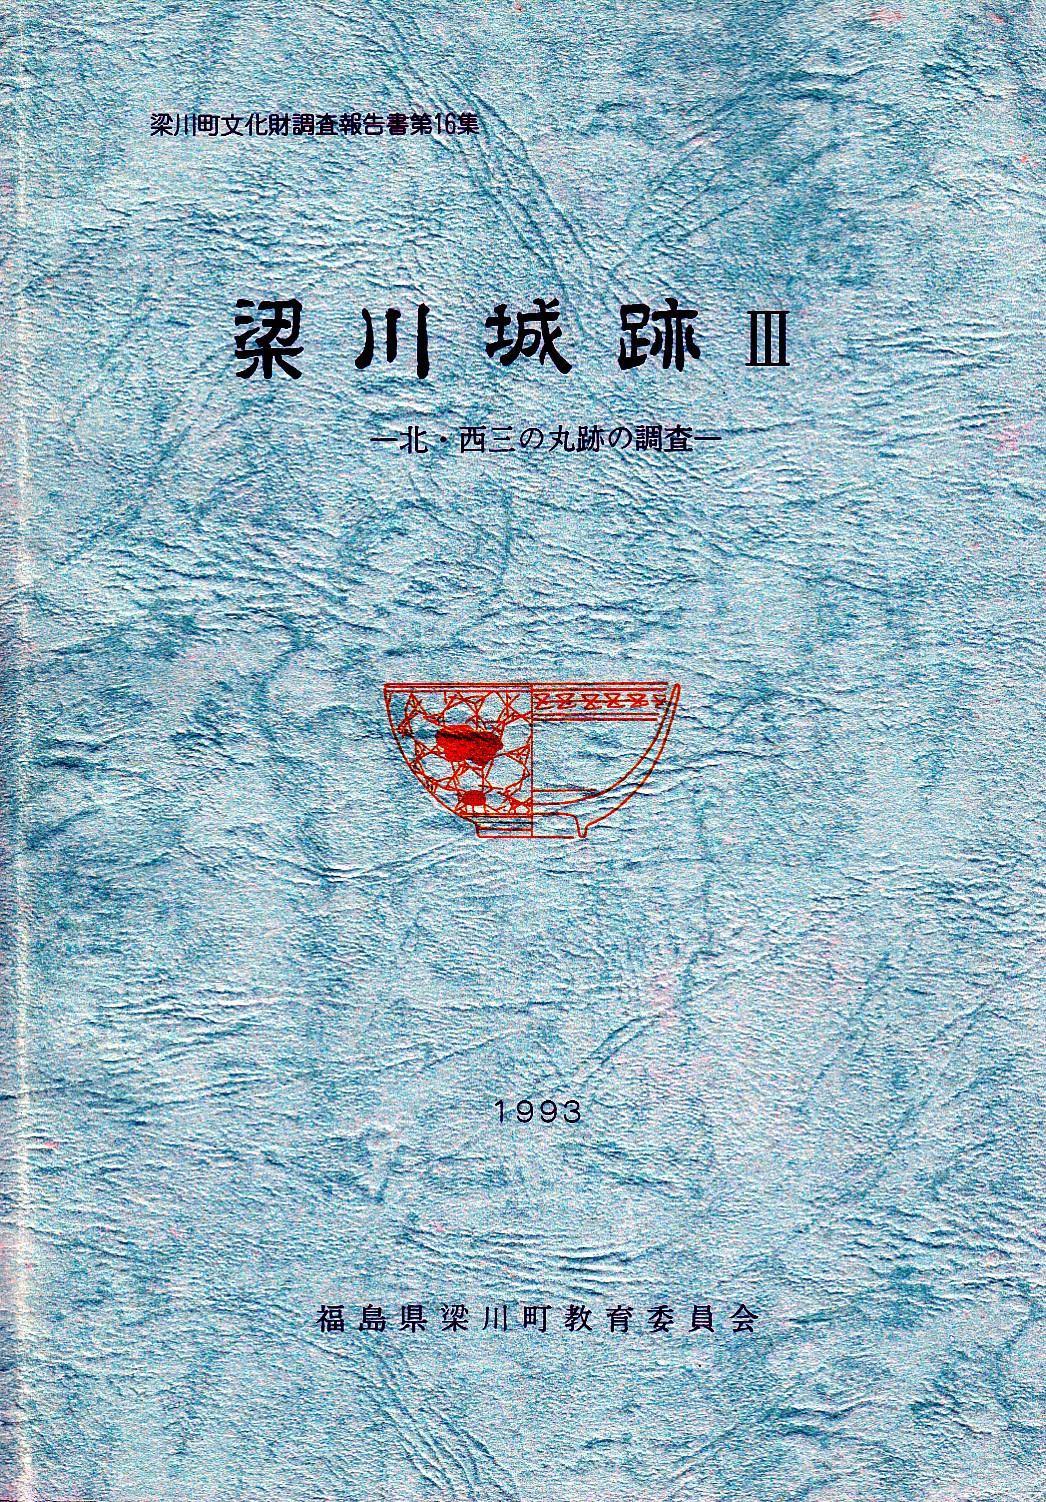 No-0105